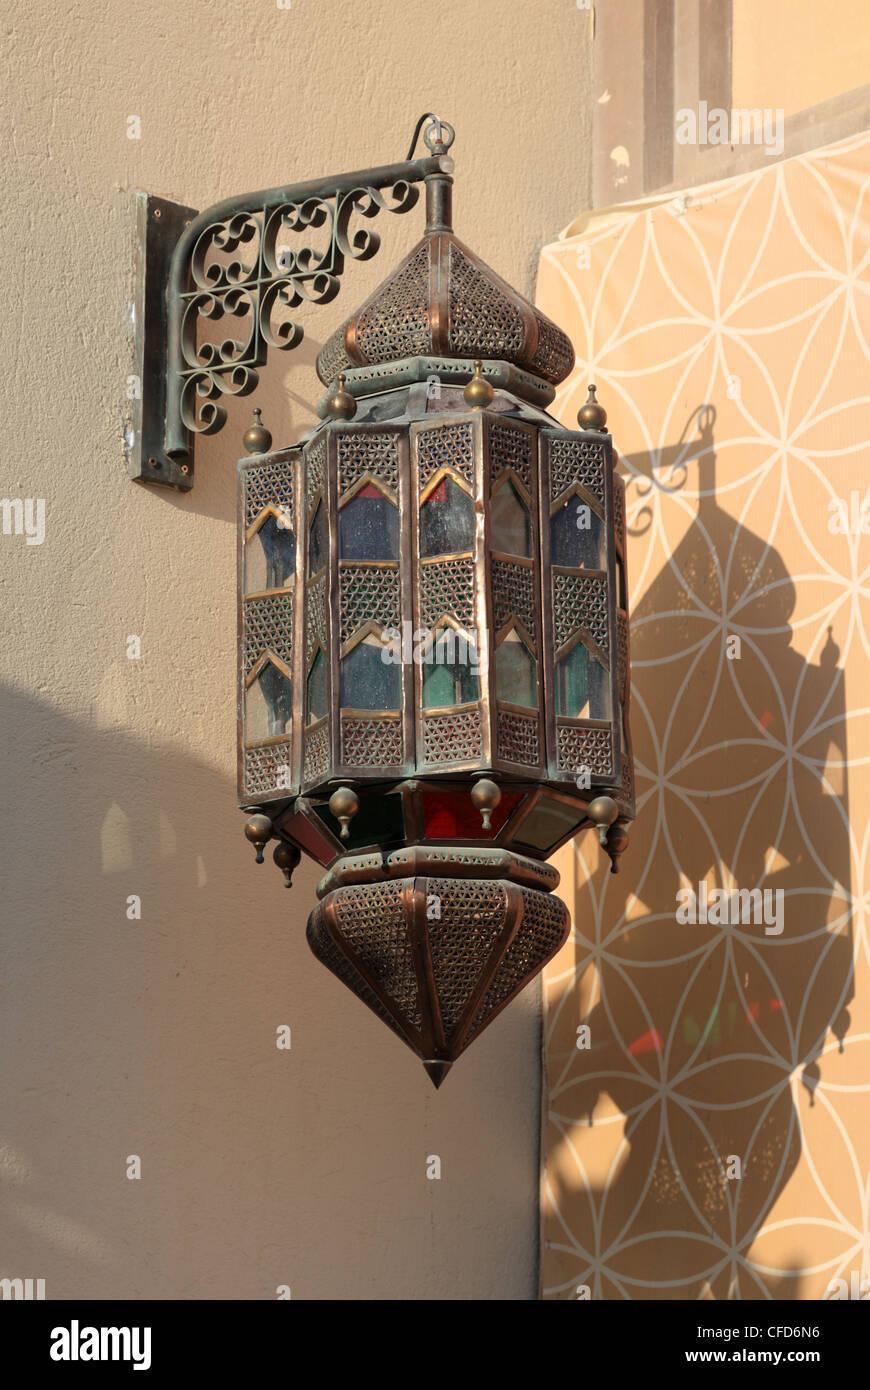 Traditional arabic lantern in Doha, Qatar Stock Photo, Royalty ... for Traditional Arabic Lamp  146hul